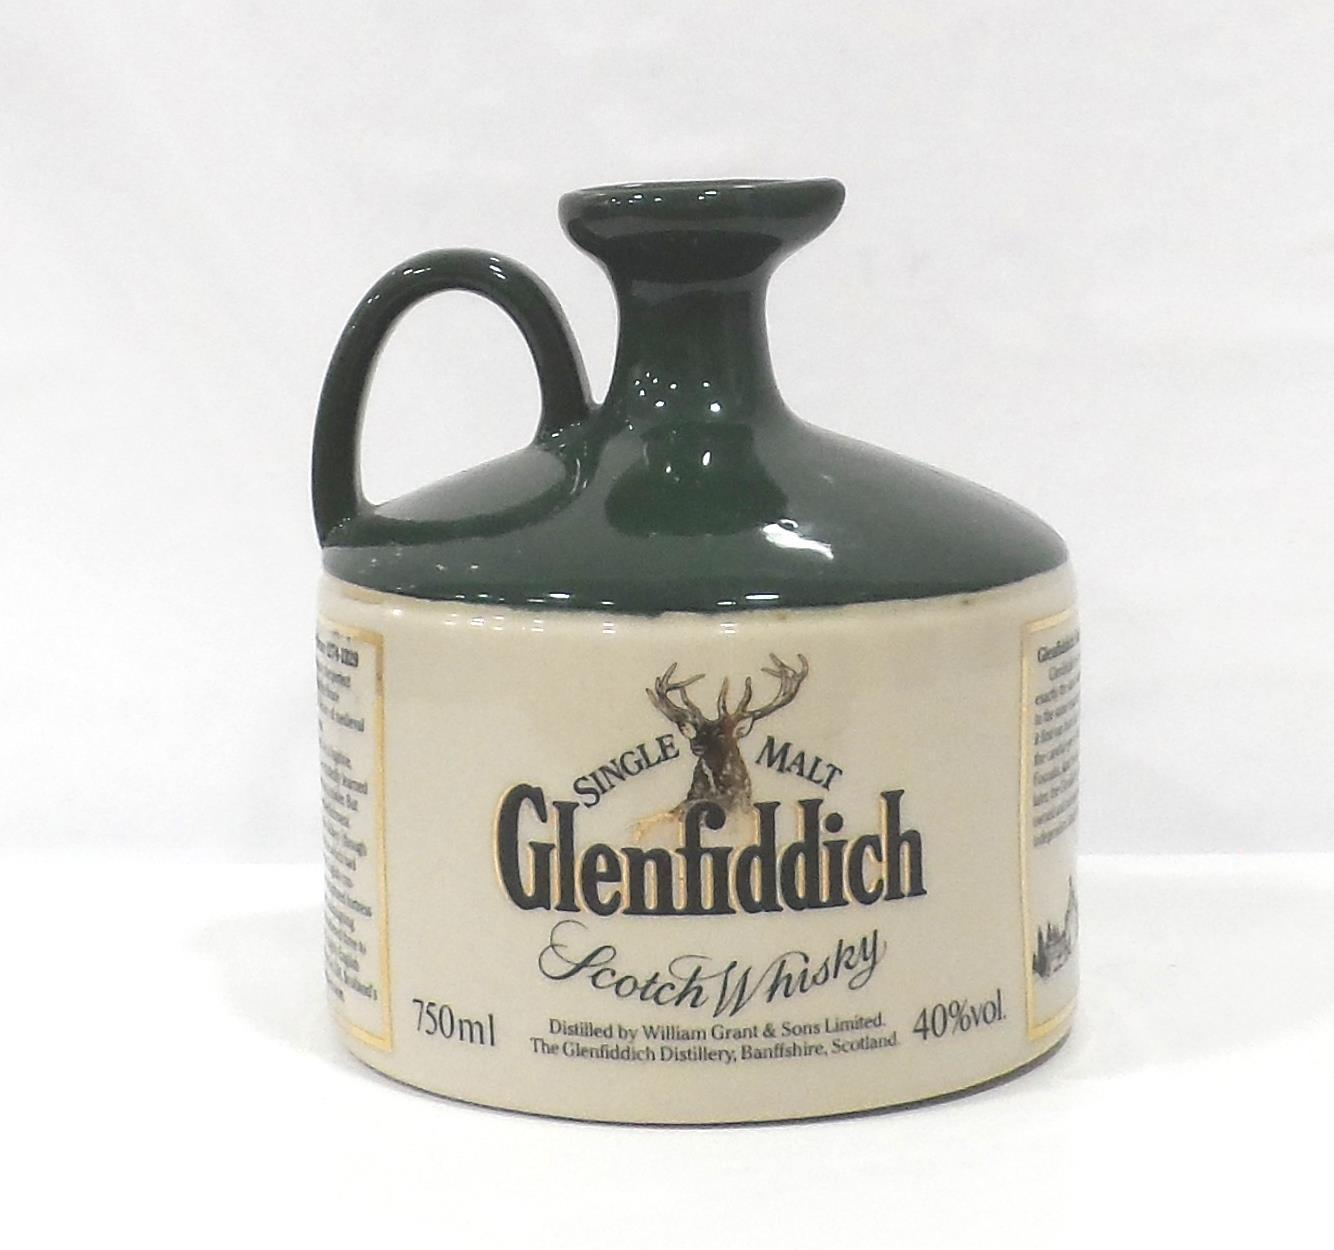 GLENFIDDICH HERITAGE RESERVE ROBERT THE BRUCE An older decanter of the Glenfiddich Heritage